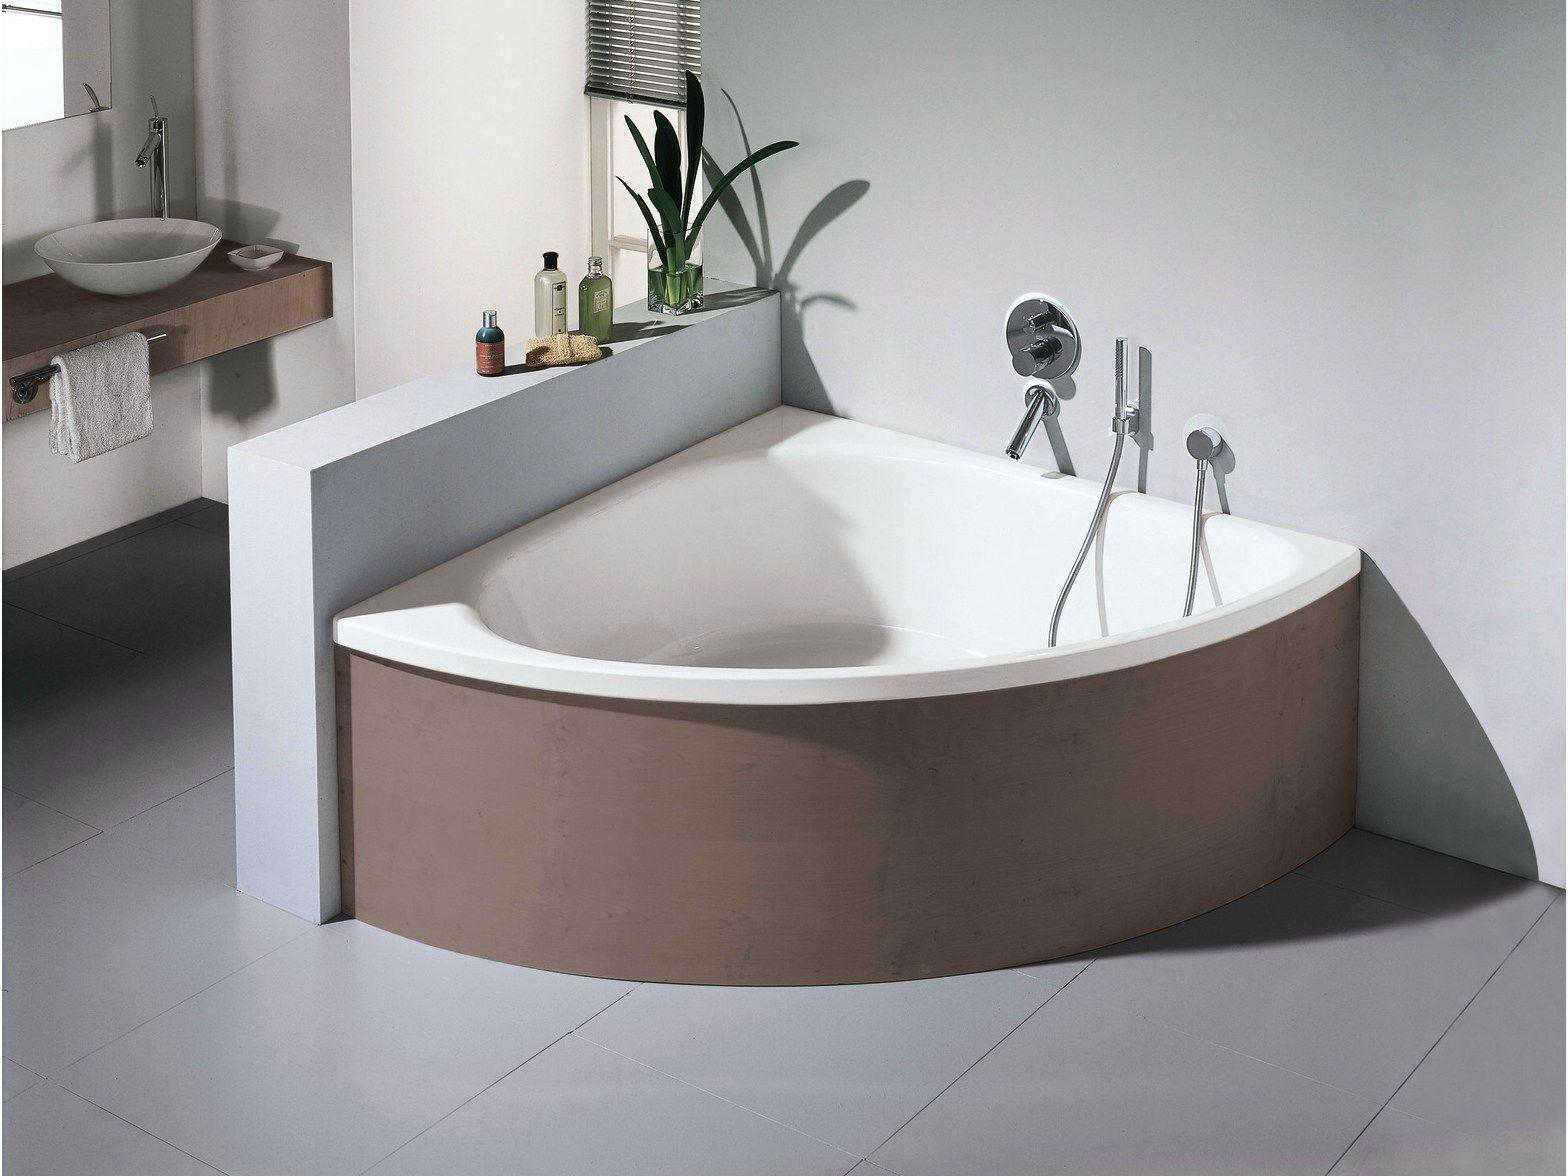 Vasca Da Bagno Angolare Dimensioni : Vasca da bagno piccola misure excellent vasche da bagno vasche da